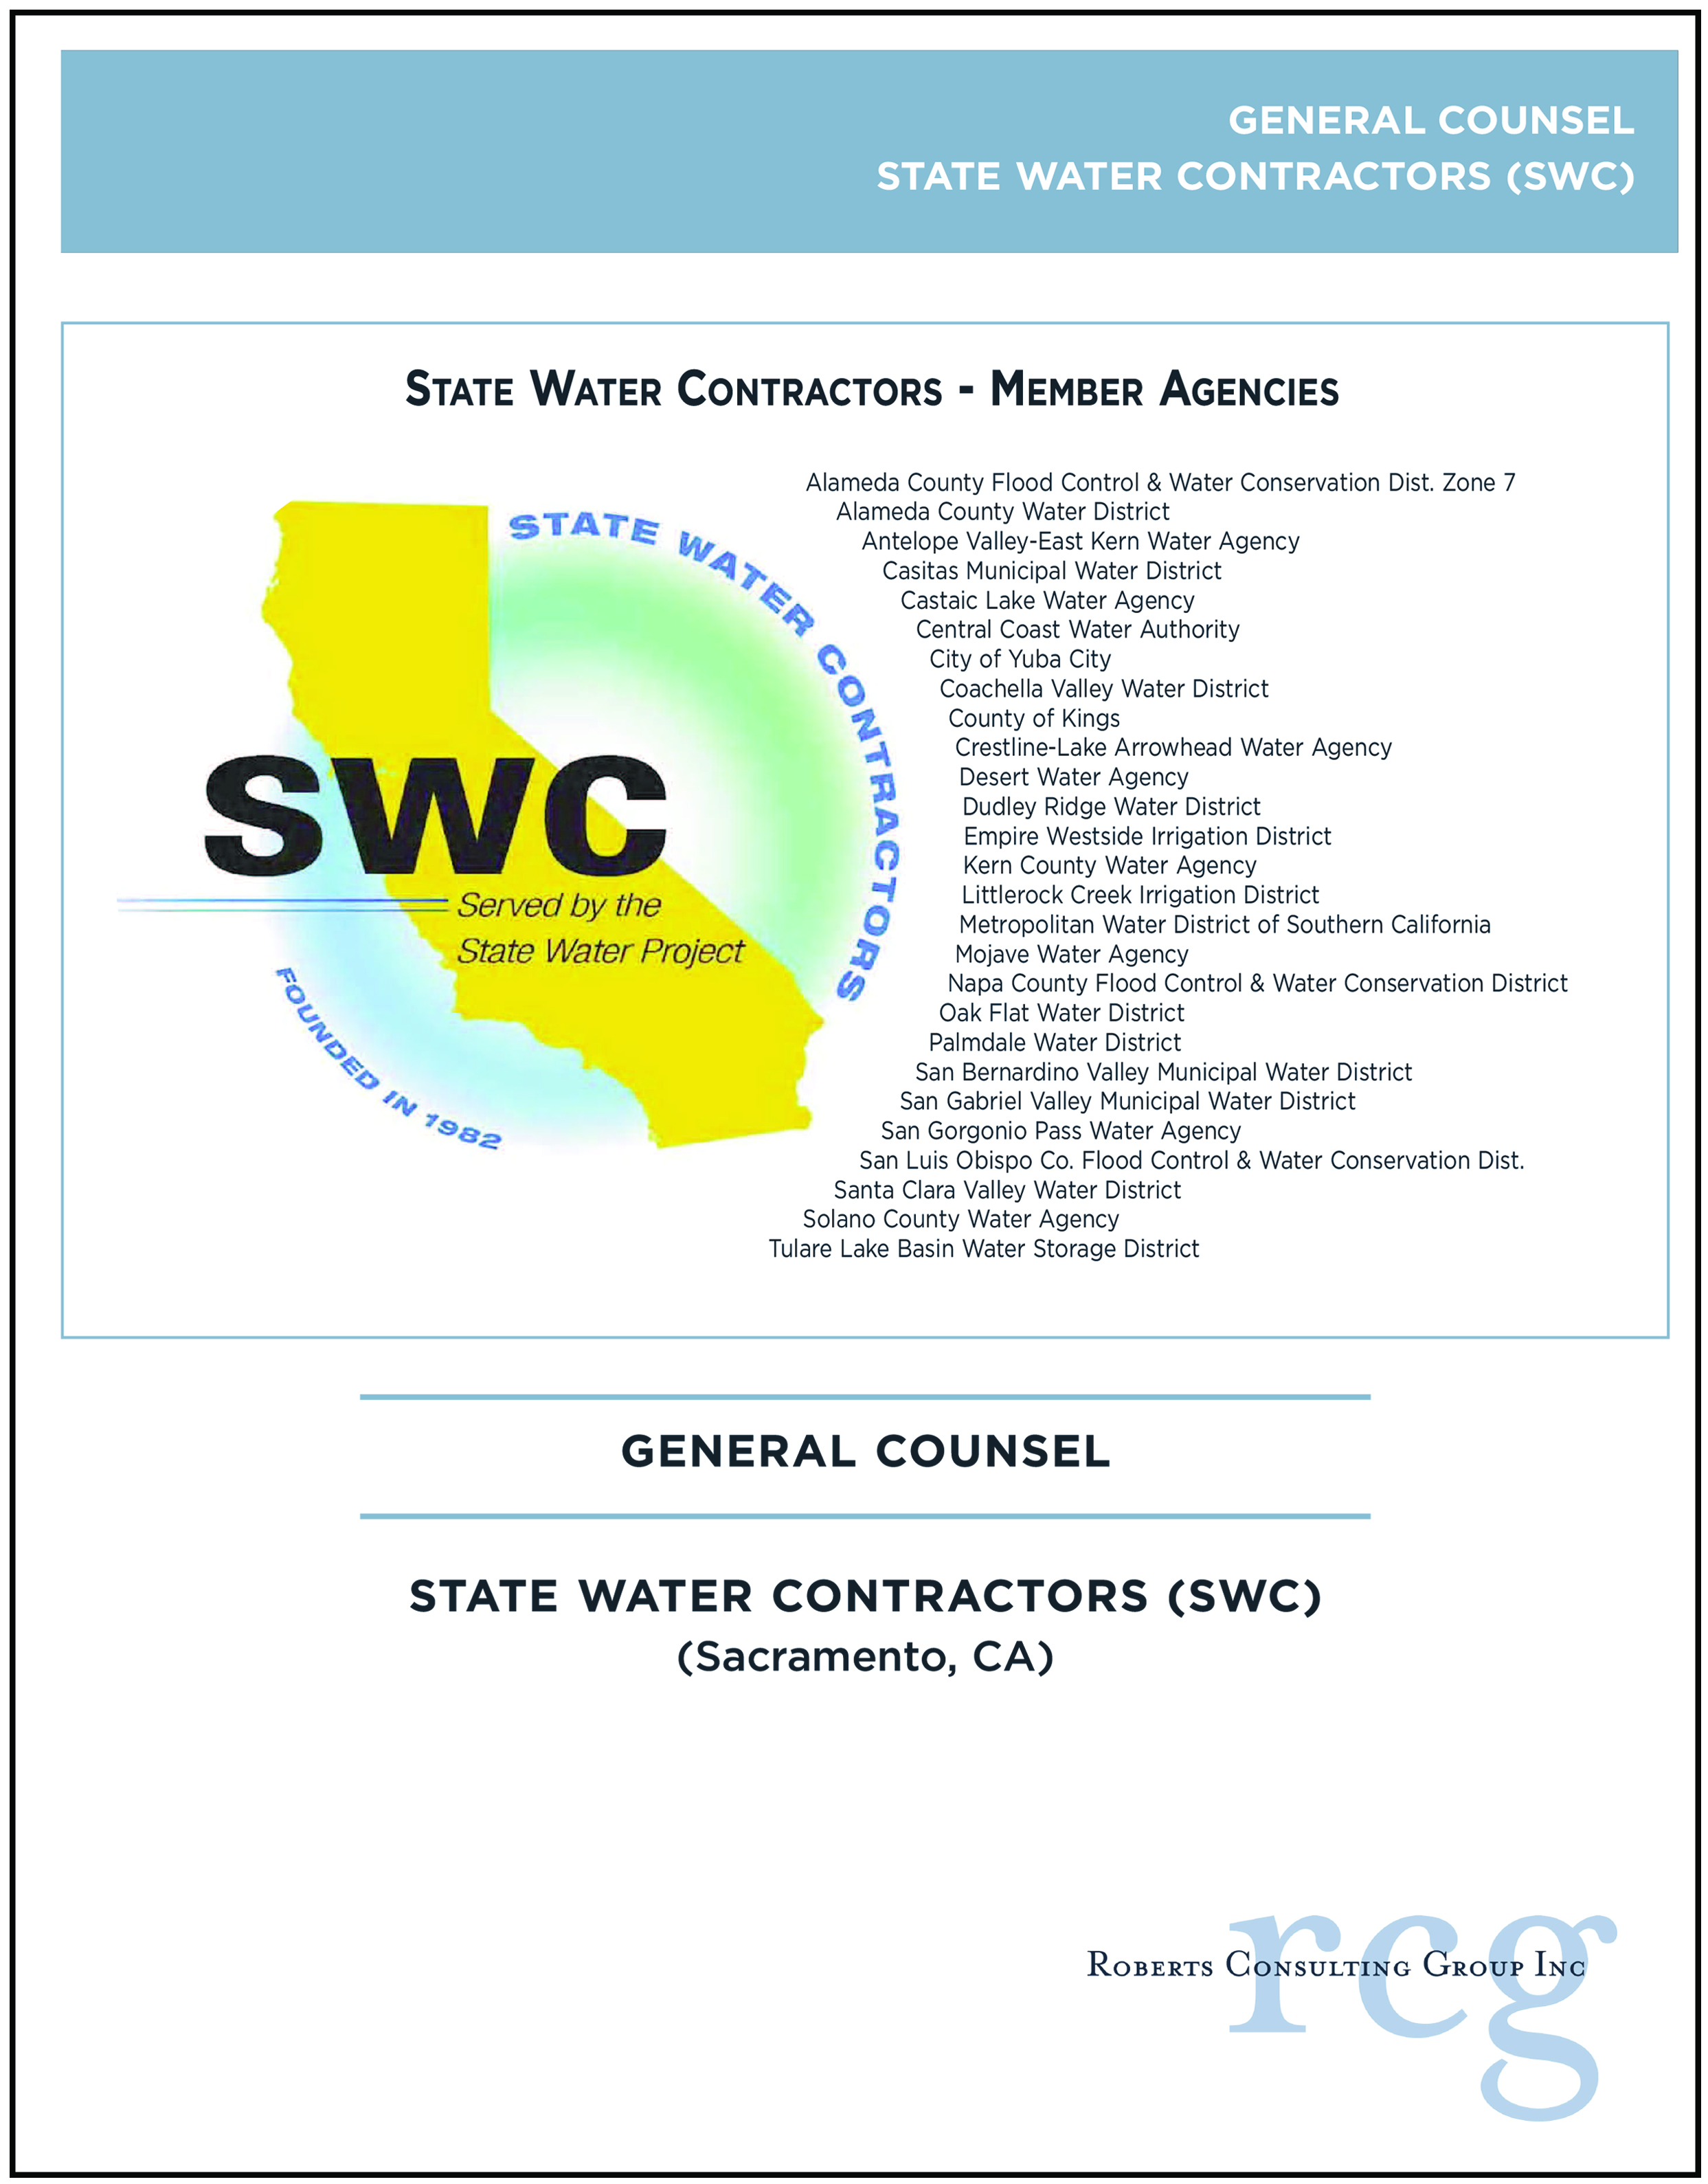 rcg_SWCgc_cover.jpg